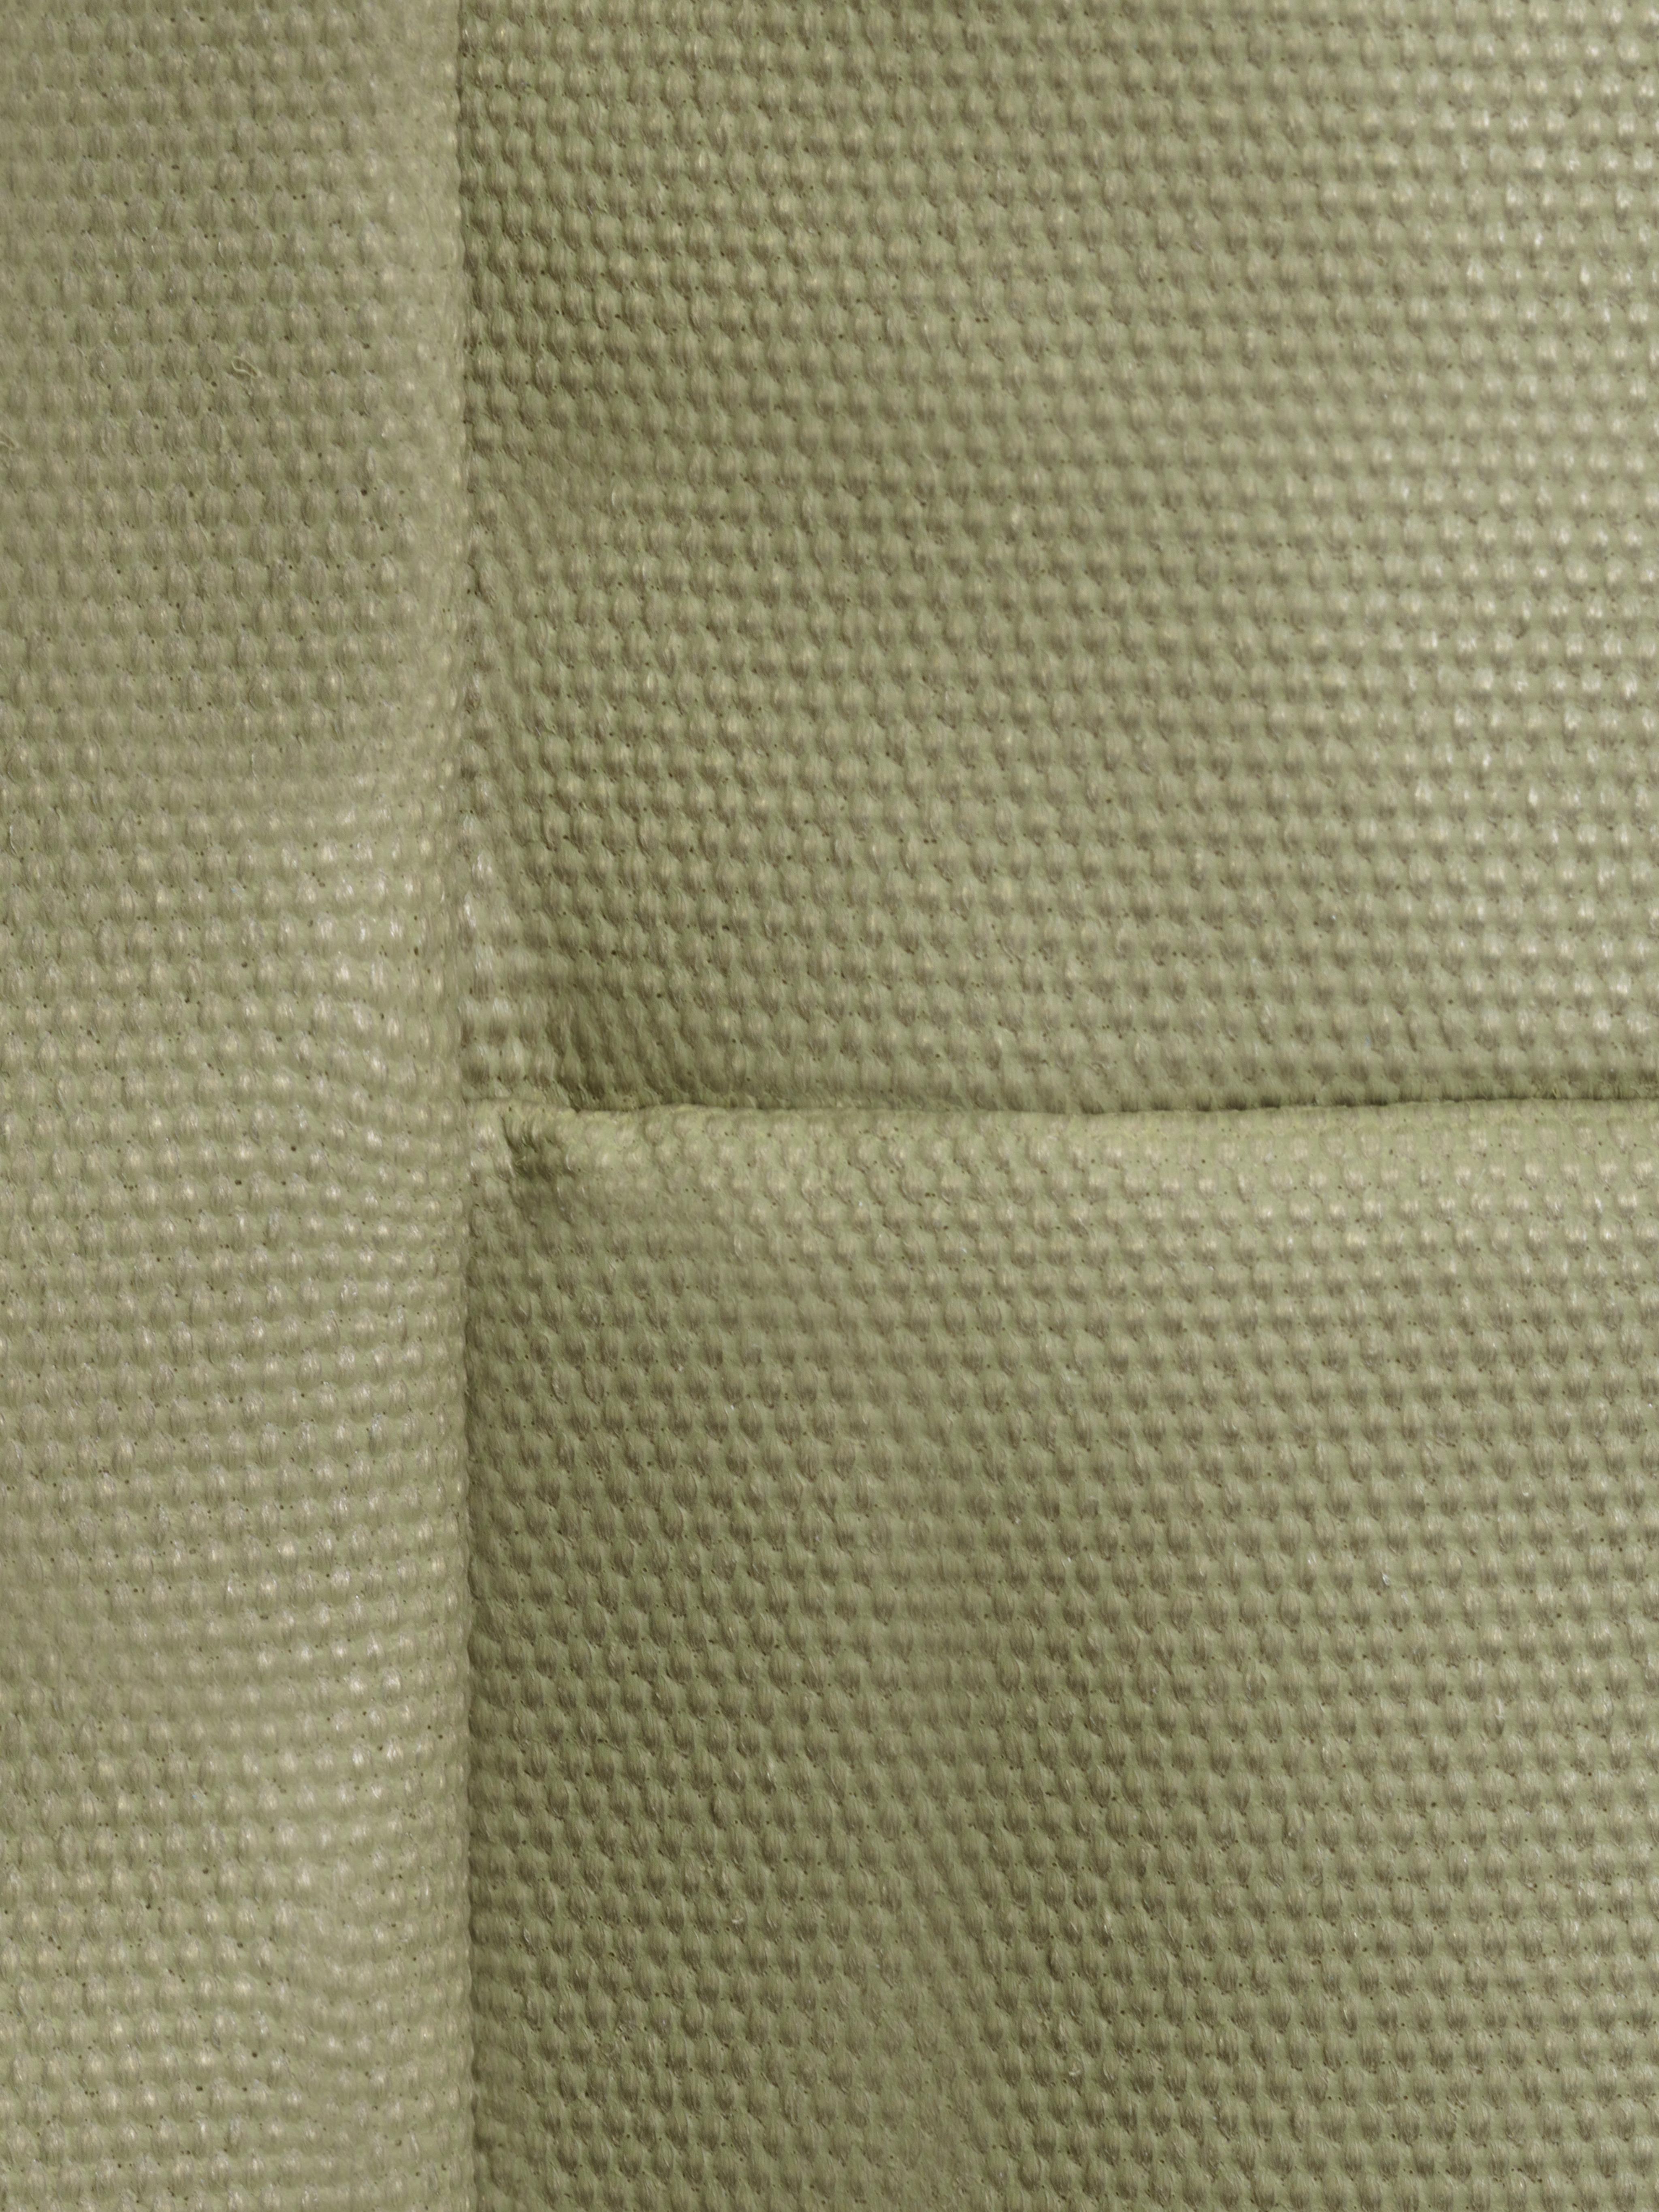 Seon Transporter 15 product image